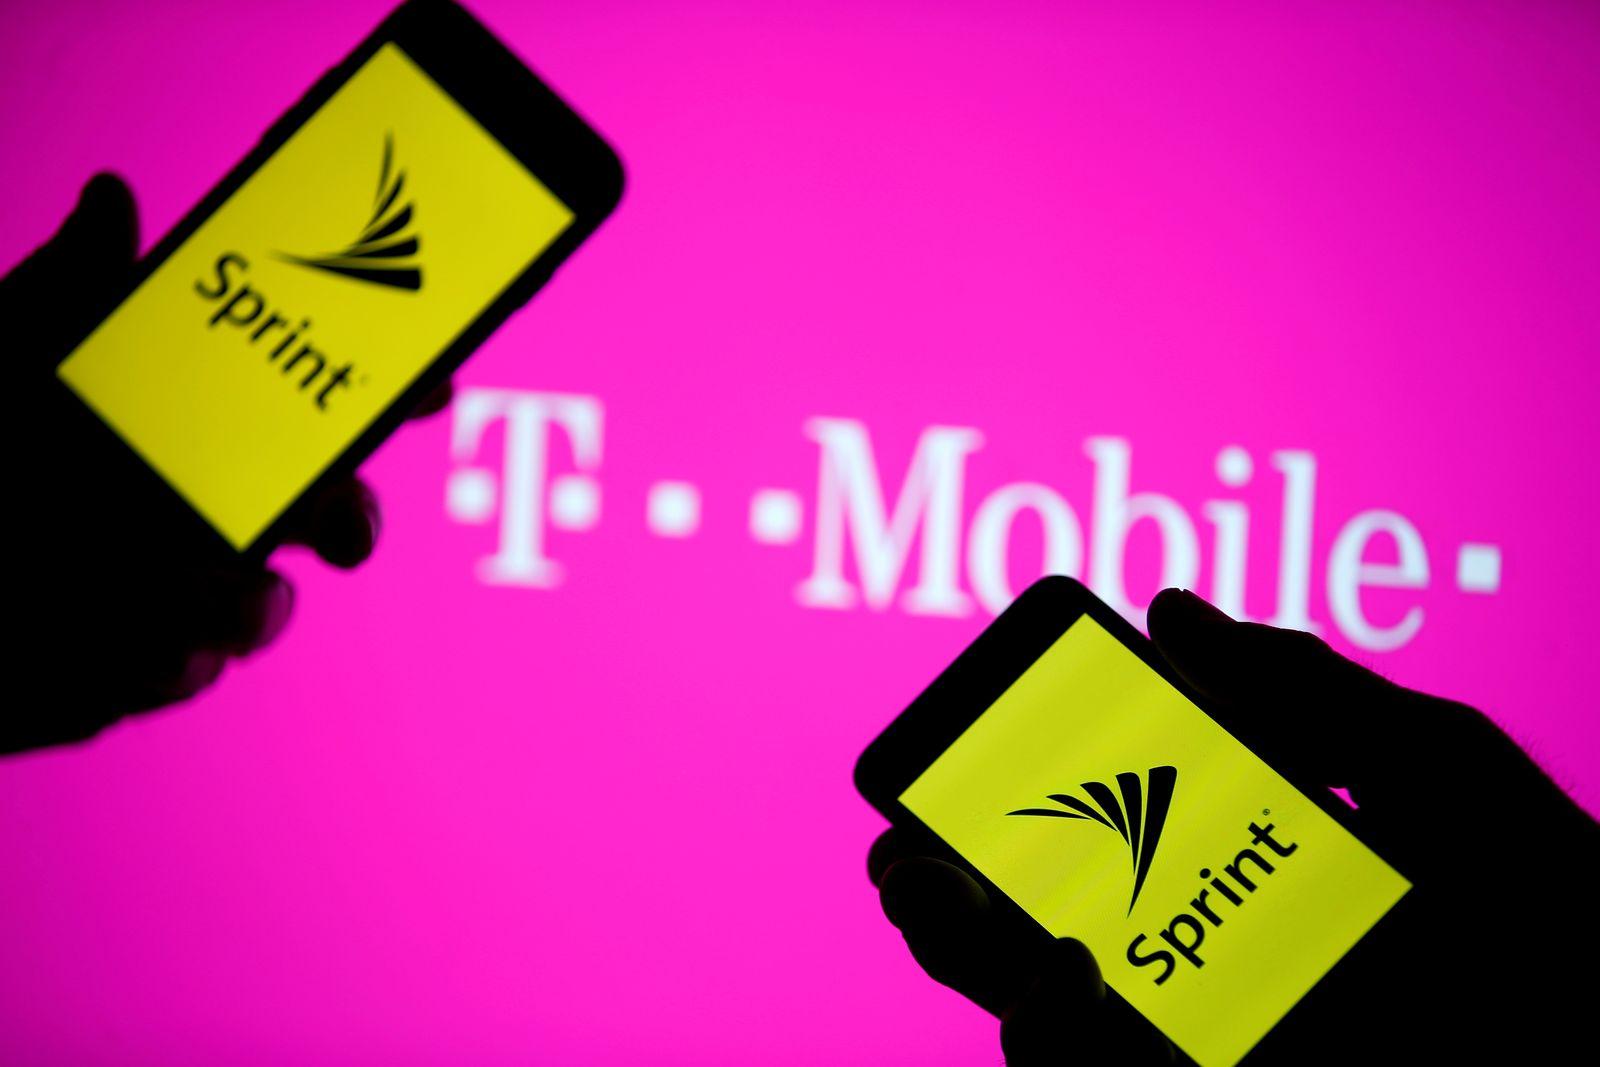 T-Mobile / Sprint / Fusion